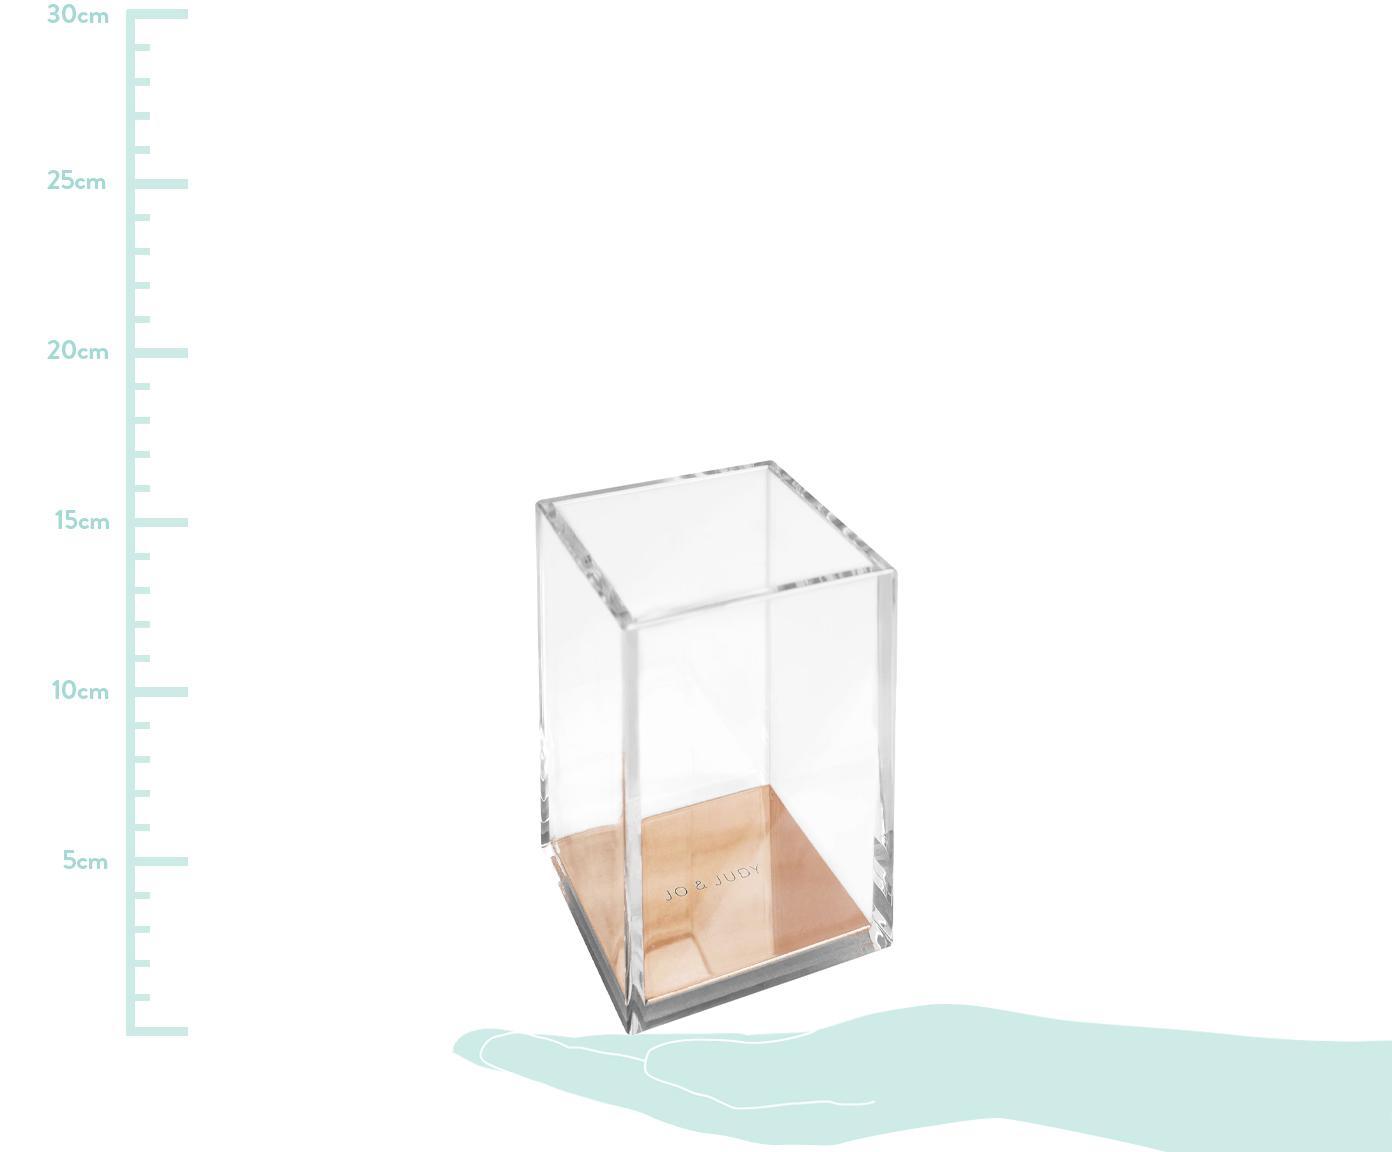 Stiftehalter Alea, Kunststoff, Metall, Kork, Transparent, Roségoldfarben, 8 x 12 cm